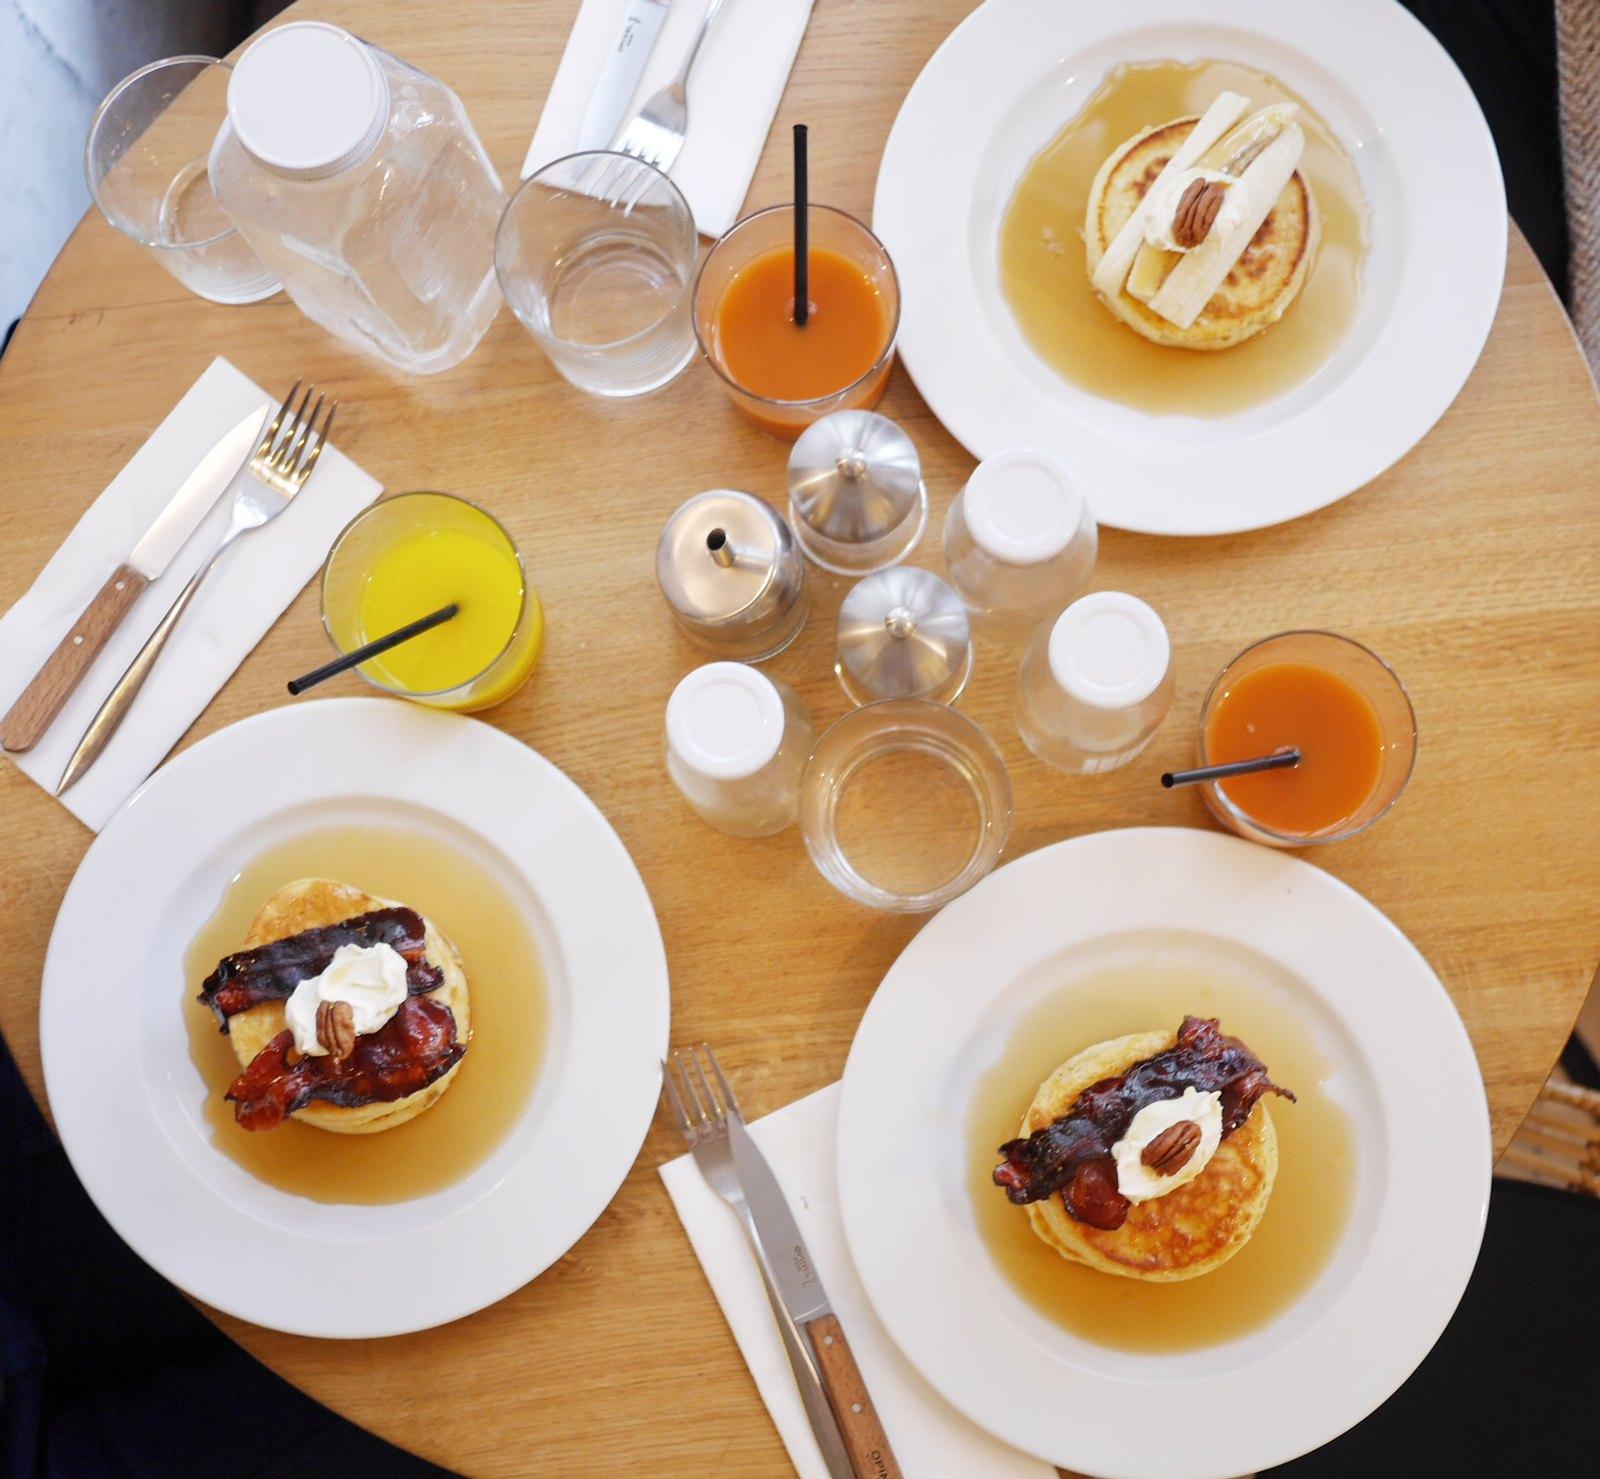 #breakfastinParis, Breakfast at Season in Marais. #dempancakes